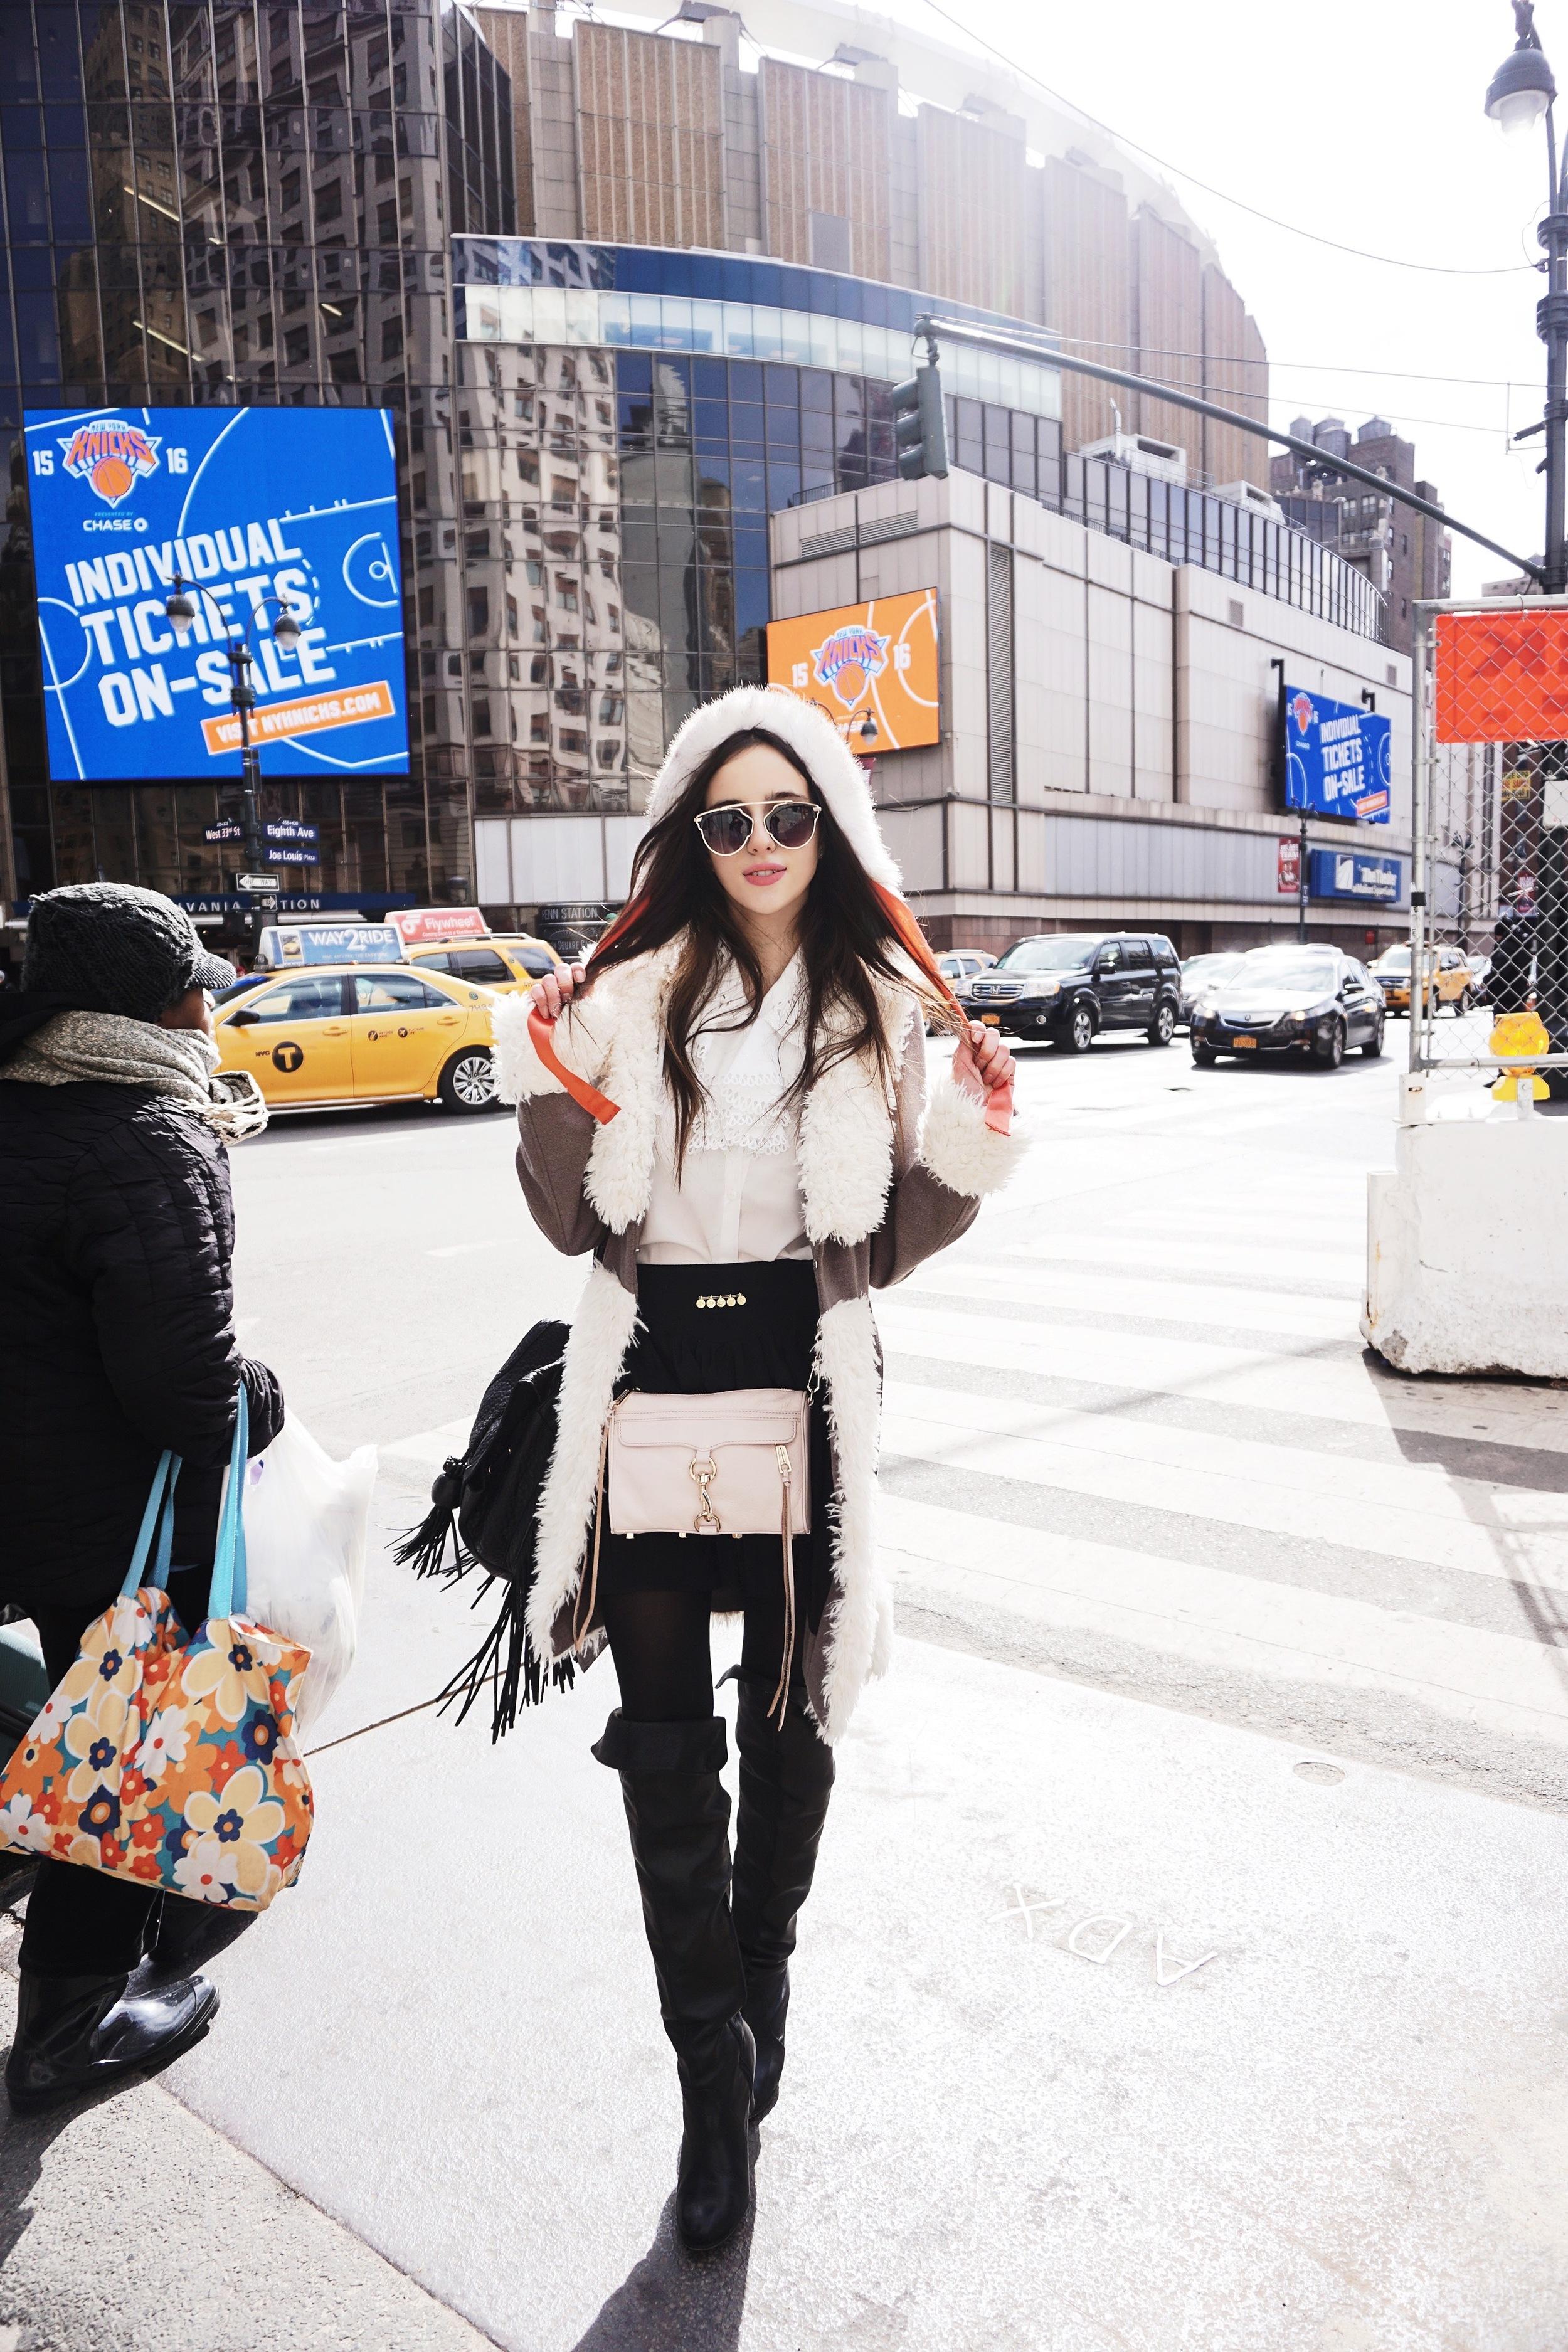 hat:  vintage    sunglasses:   free people     blouse:  vintage    skirt:  vintage    jacket:  n/a    crossbody:   rebecca minkoff     bag:  urban outfitters    boots:  free people